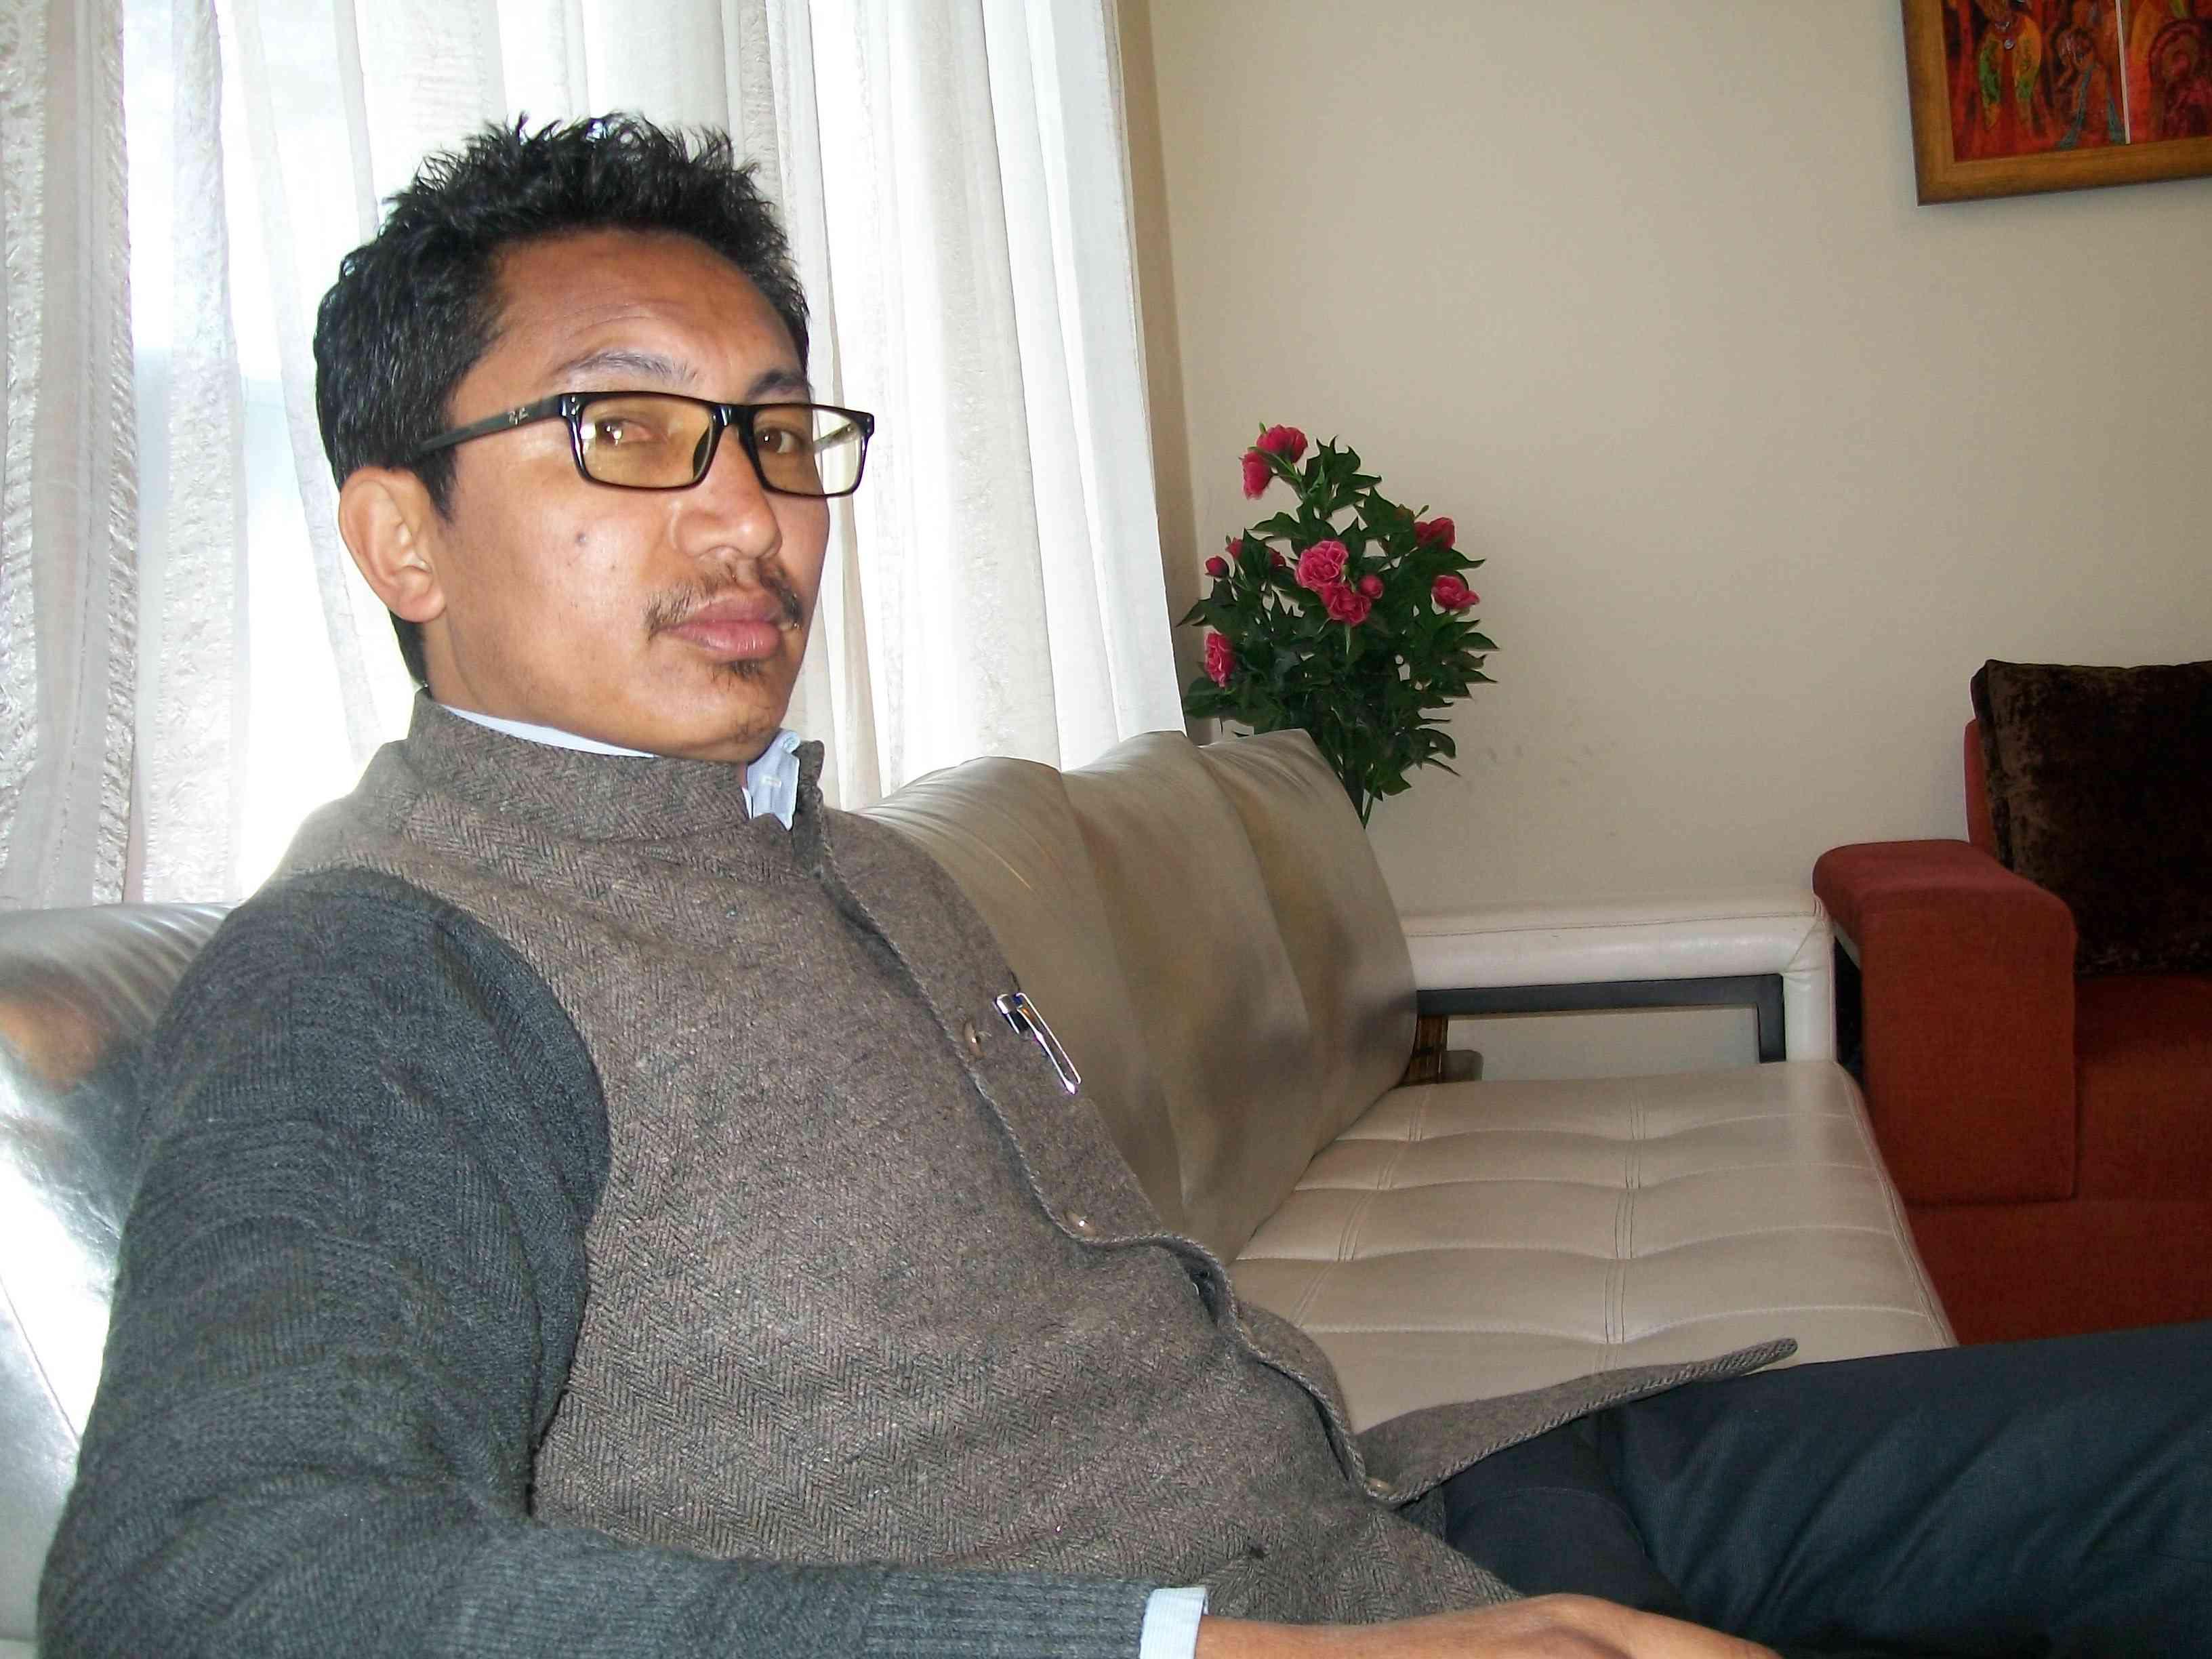 The BJP candidate, 33-year-old Jamyang Tsering Namgyal.